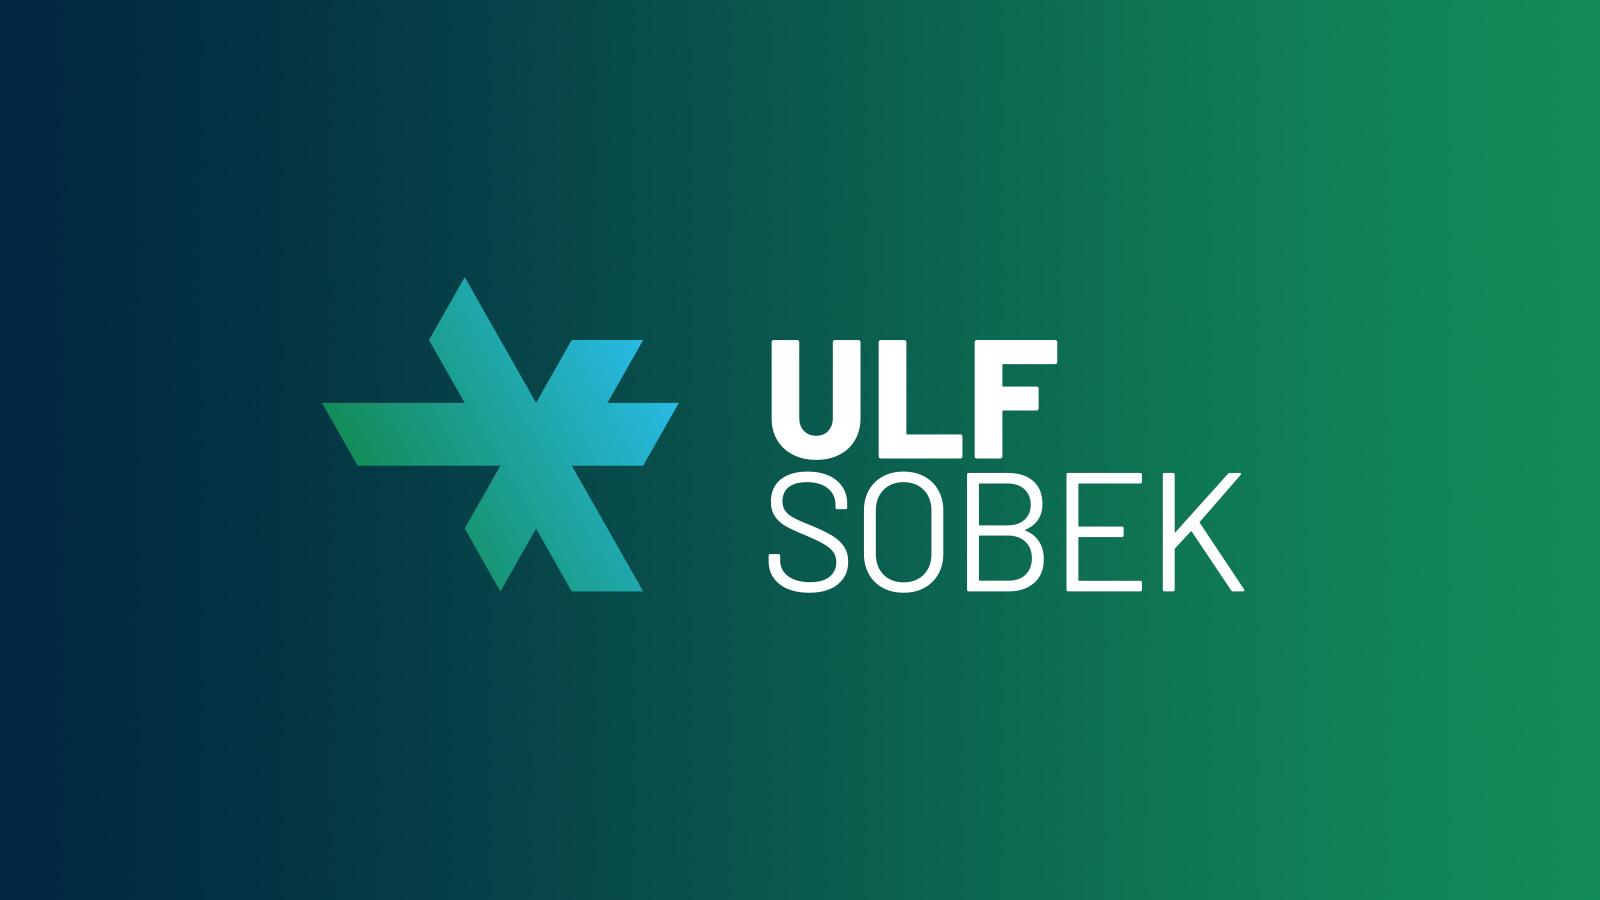 Logodesign für Ulf Sobek